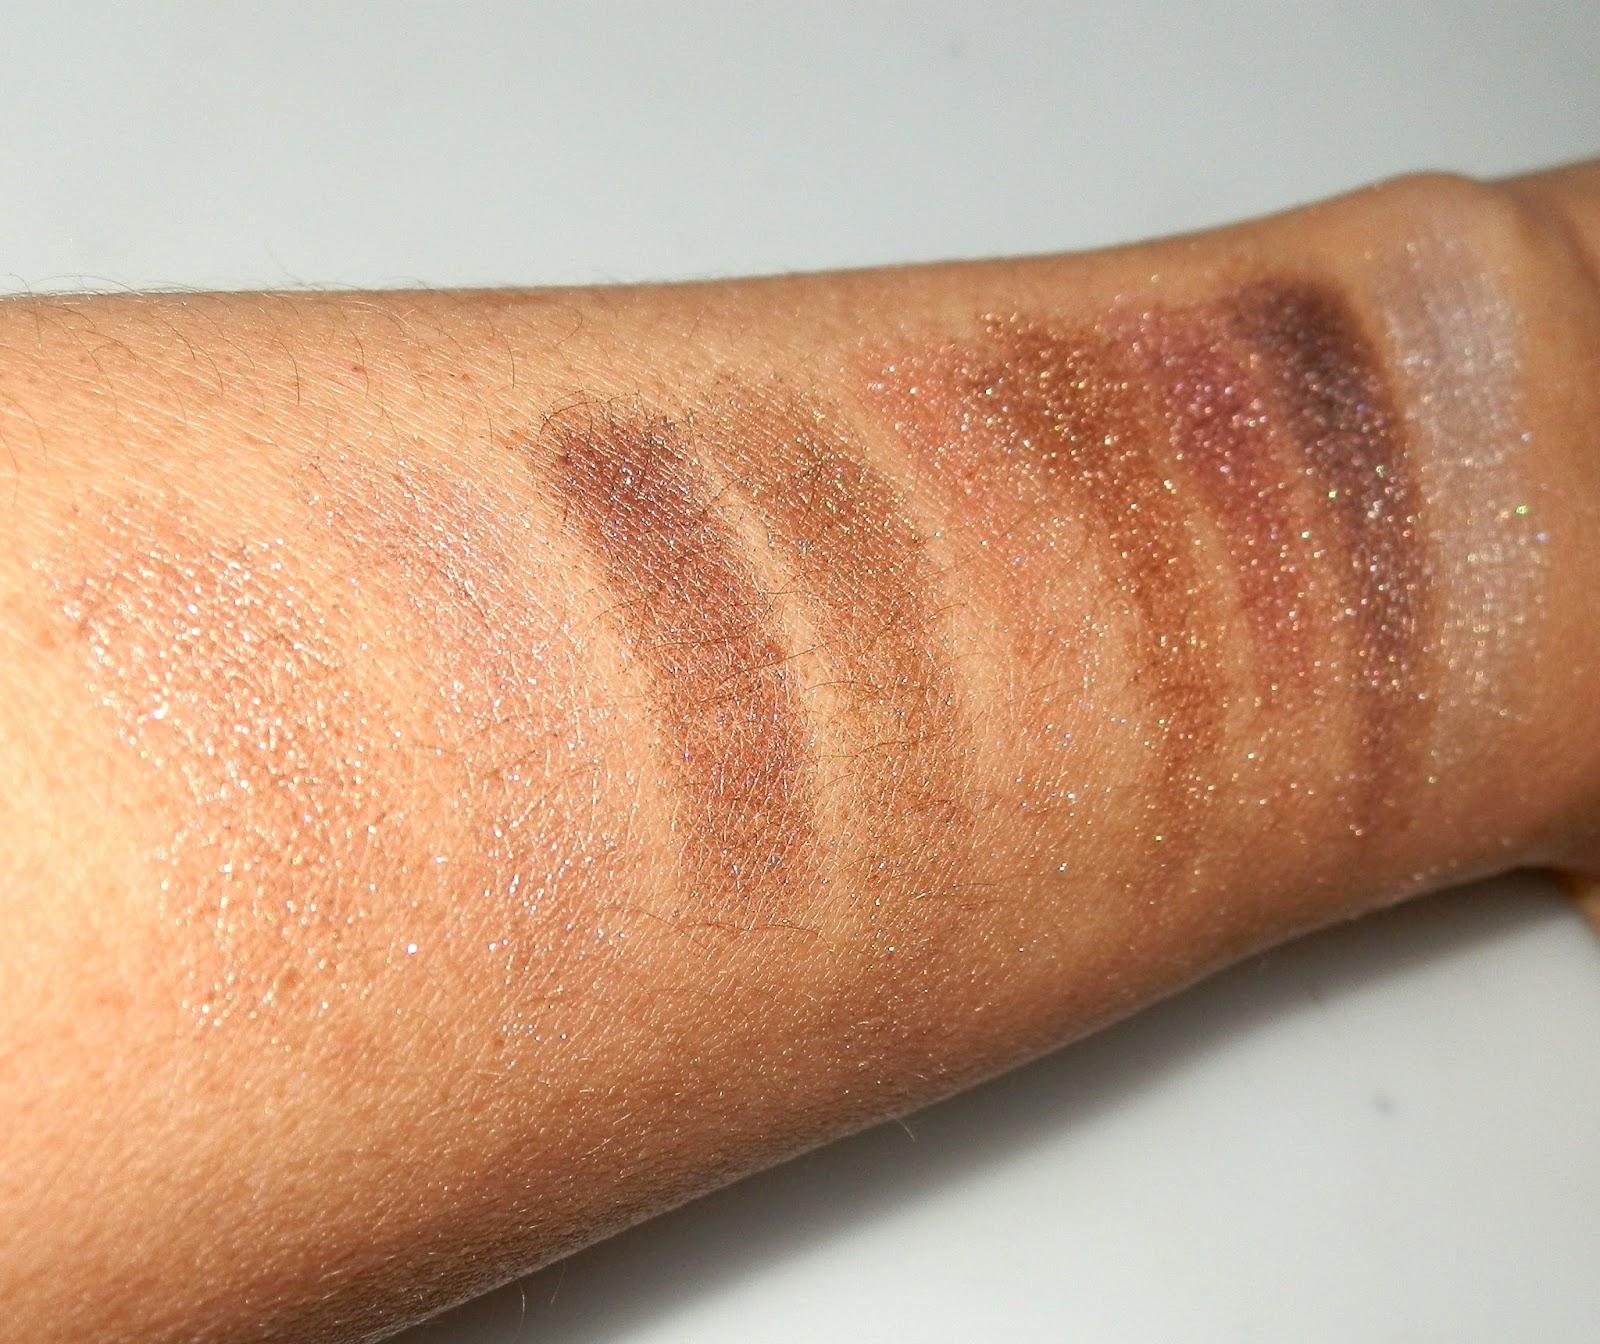 Wild Child Baked Eyeshadow Palette by BH Cosmetics #18